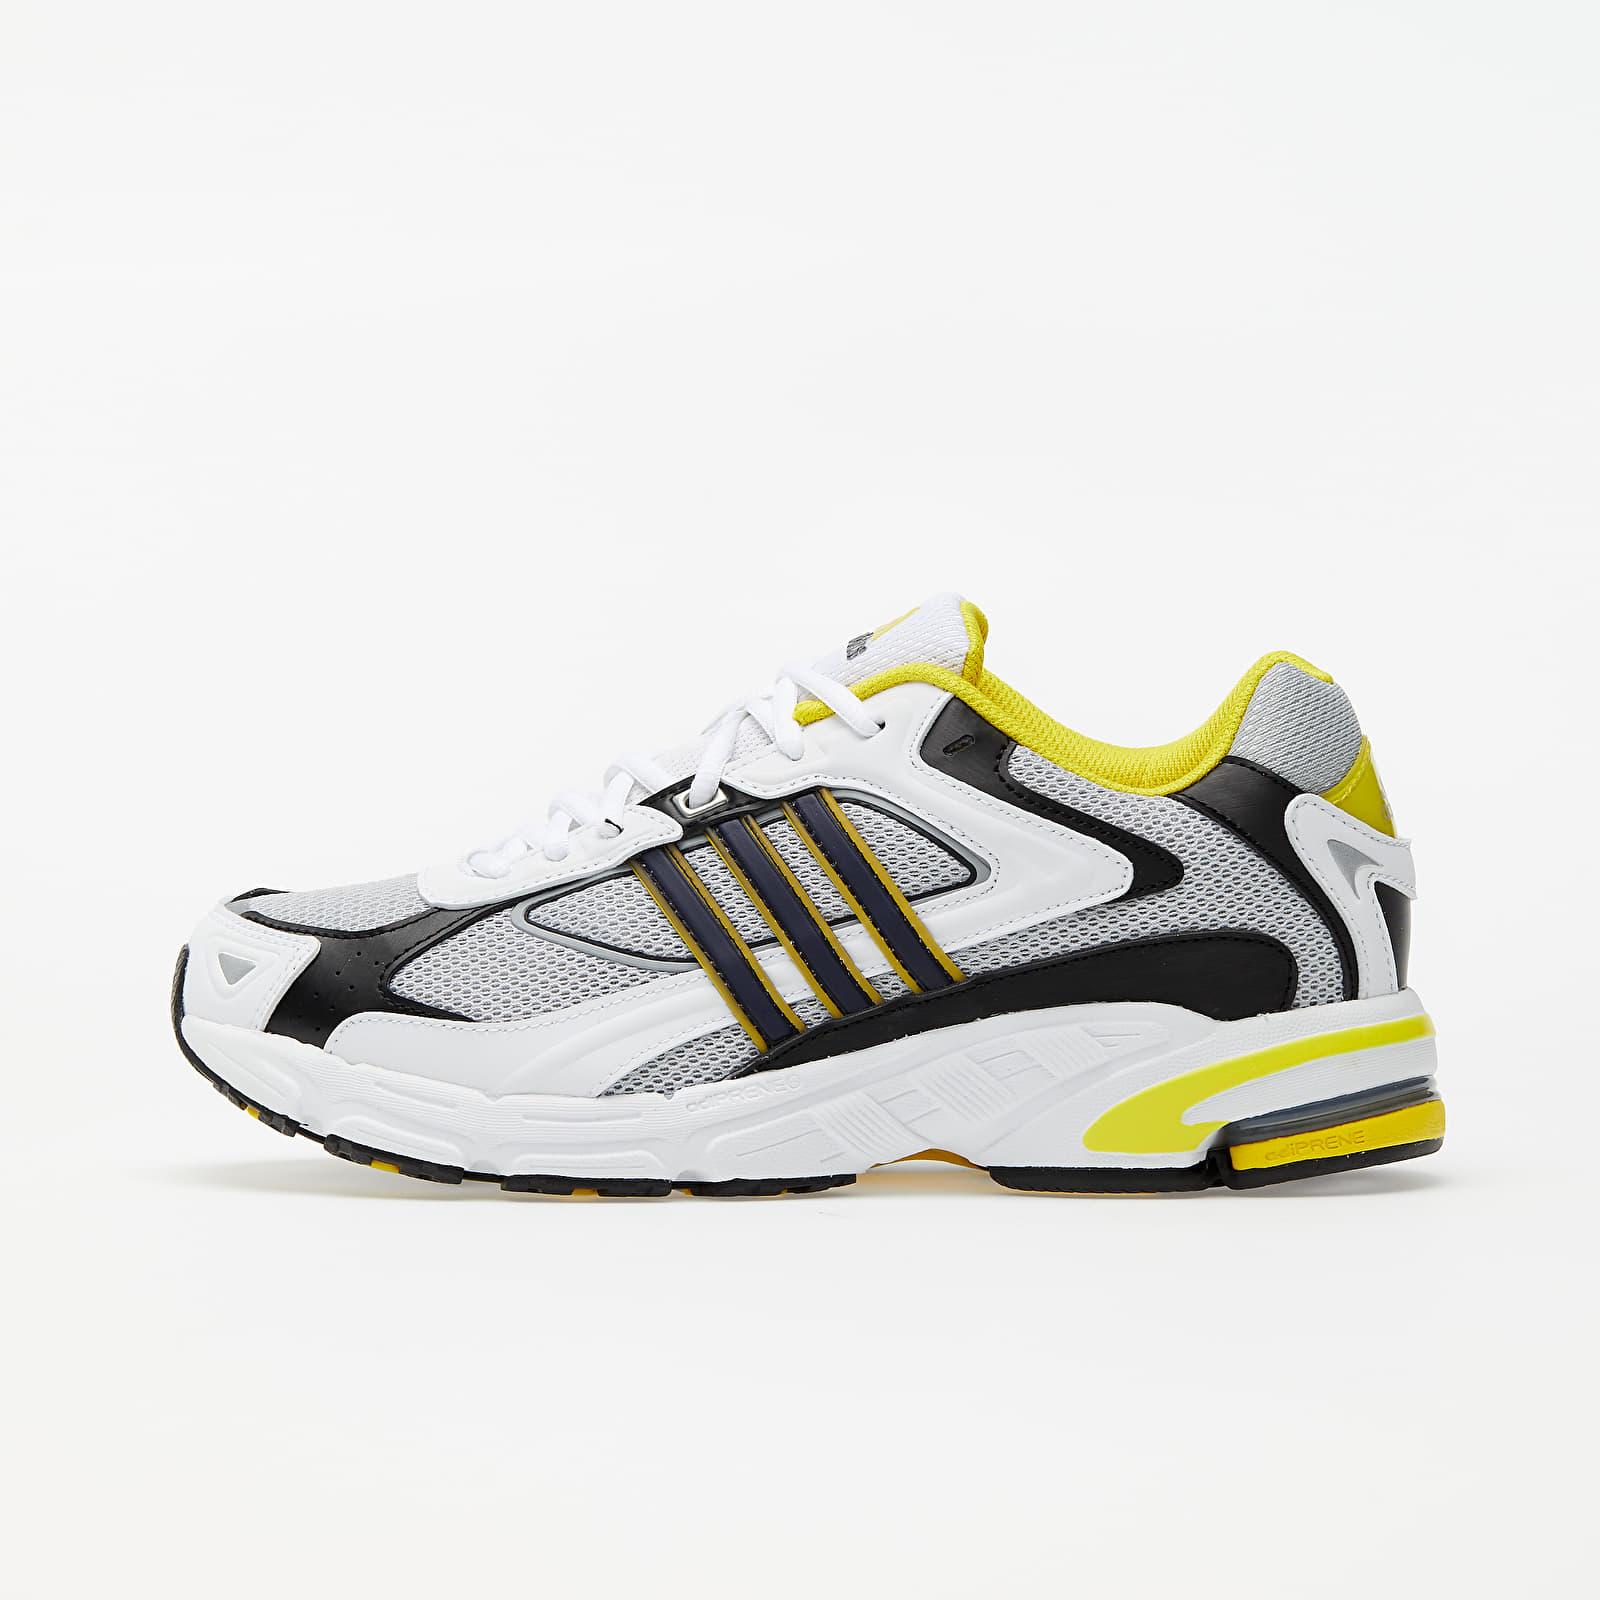 adidas Response CL Ftwr White/ Core Black/ Yellow FX7718